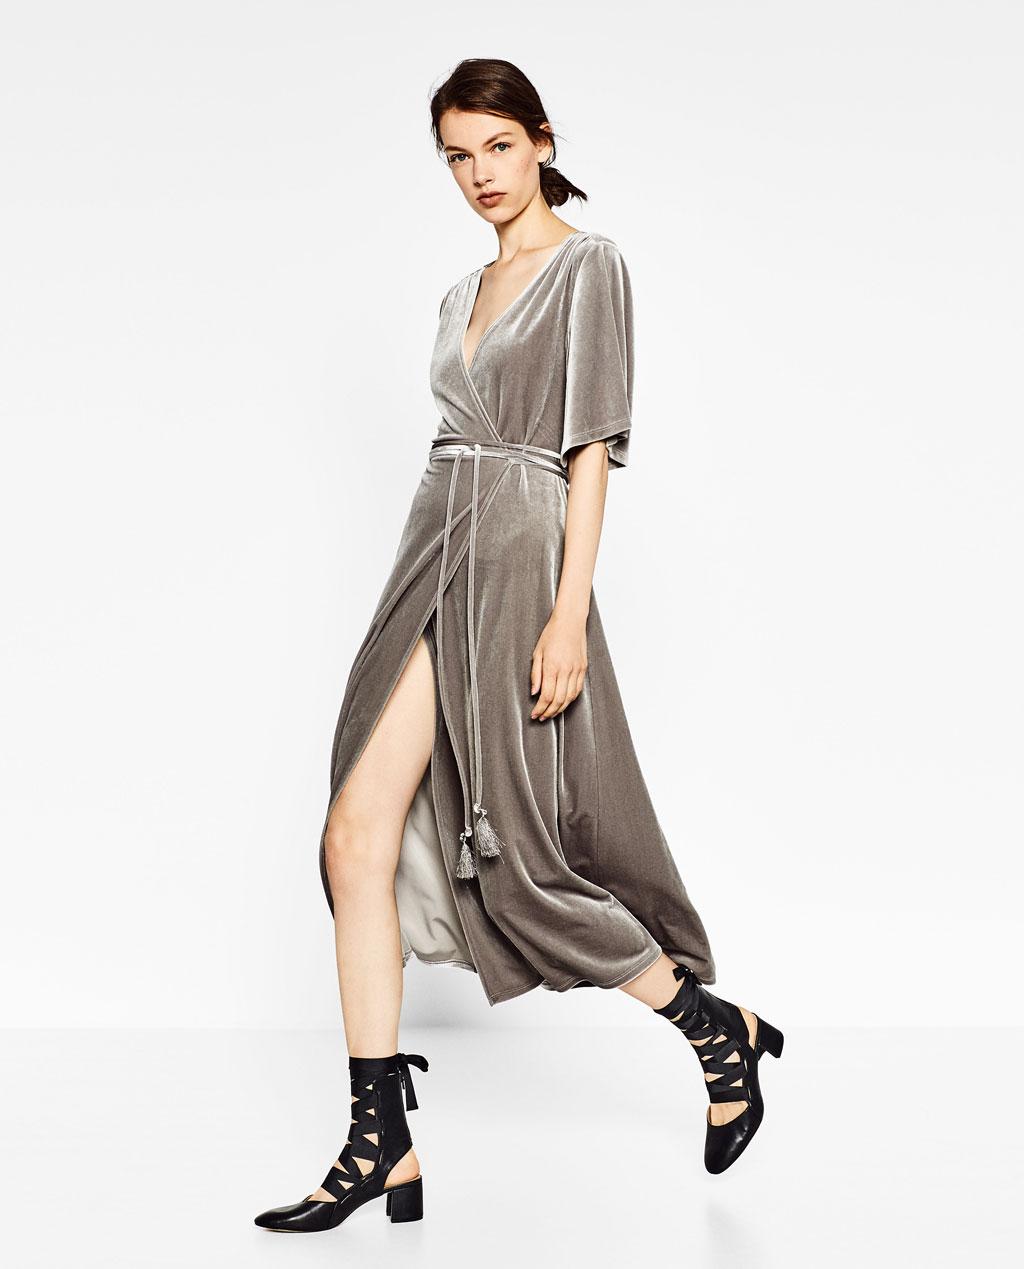 Vải nhung Zara